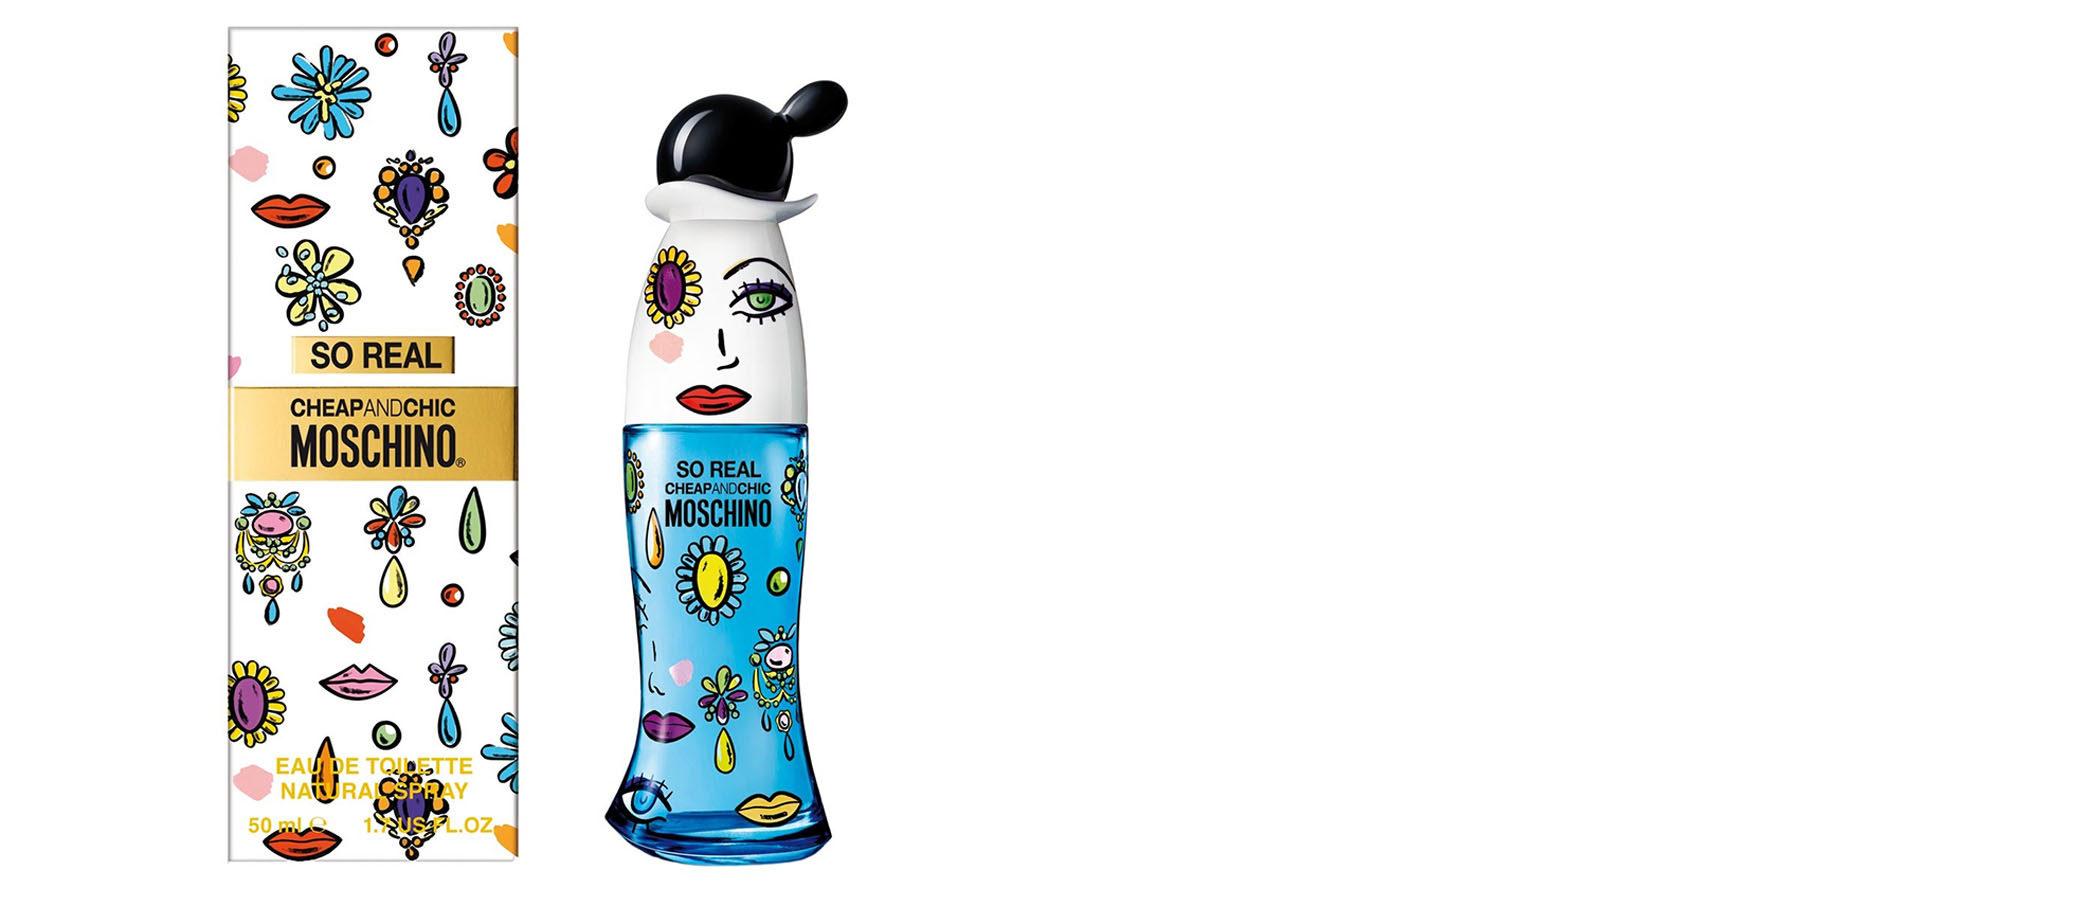 Moschino lanza su nueva fragancia 'So Real Cheap & Chic' tomando como inspiración a Popeye y Dalí